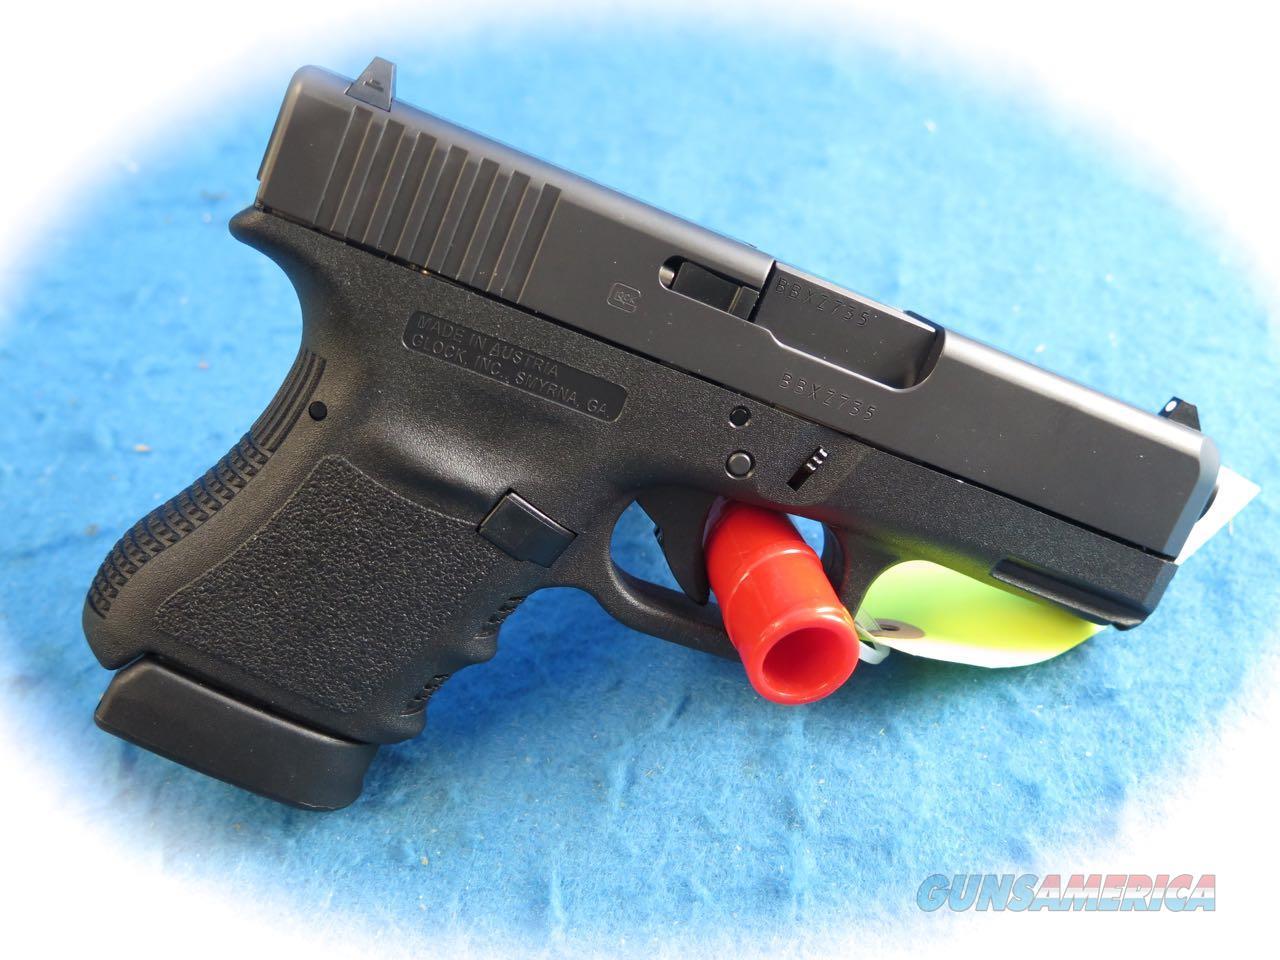 Glock Model 36 .45 ACP Semi Auto Pistol **New**  Guns > Pistols > Glock Pistols > 29/30/36